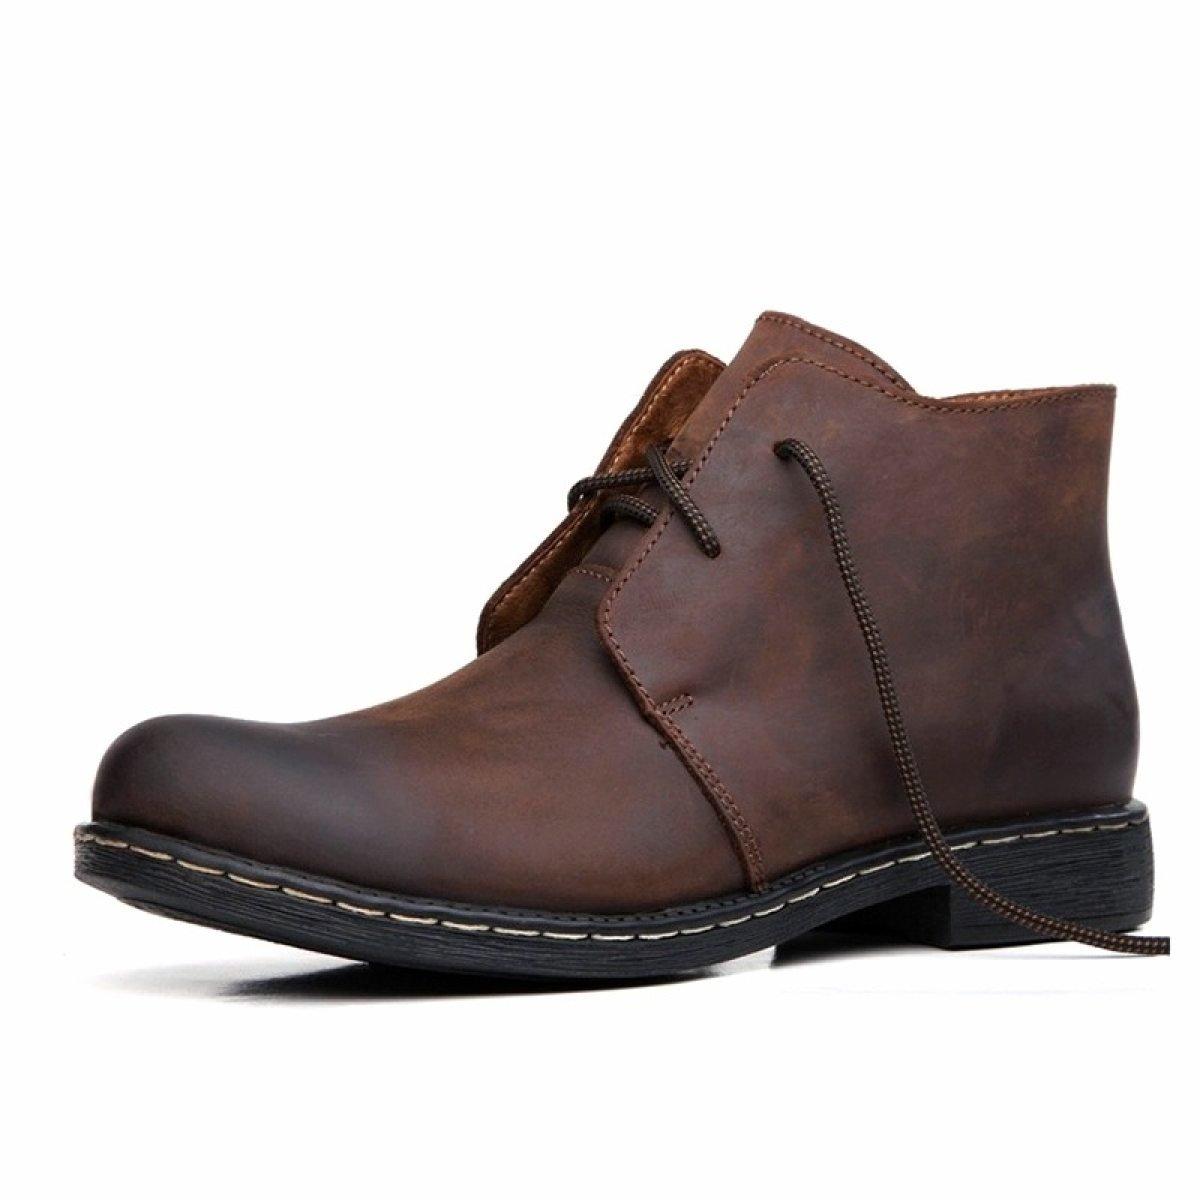 Herren Stiefel Winter Plus Baumwolle Mode Leder Stiefel Casual Stiefel Hohe Hilfe Martin Stiefel GTYMFHcompany